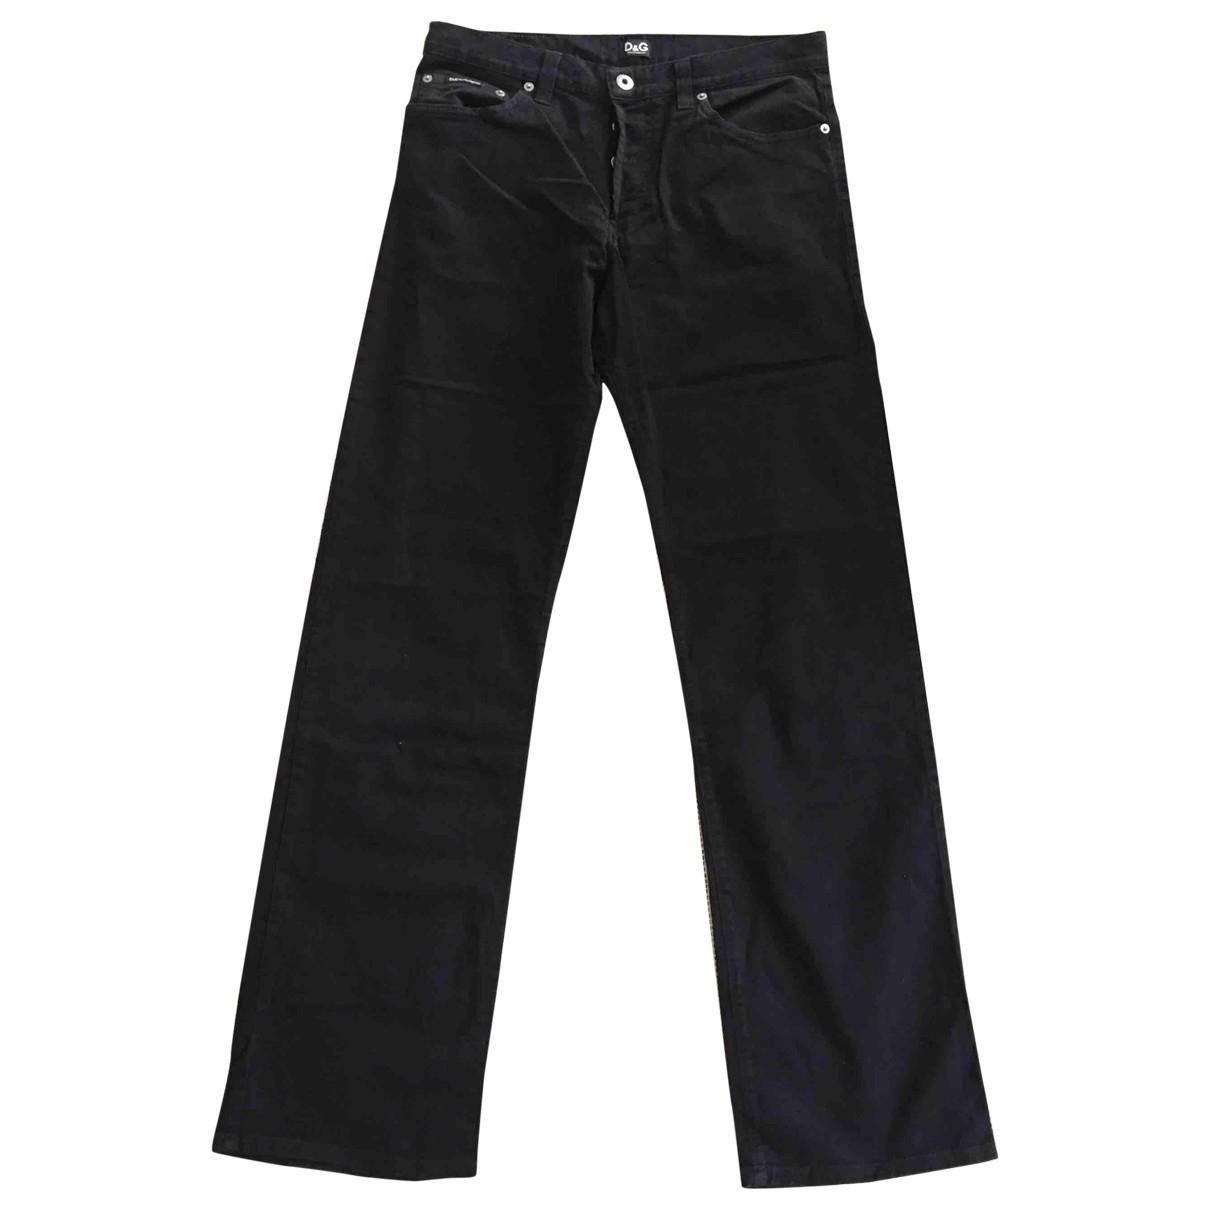 D&g \N Black Cotton Trousers for Men M International